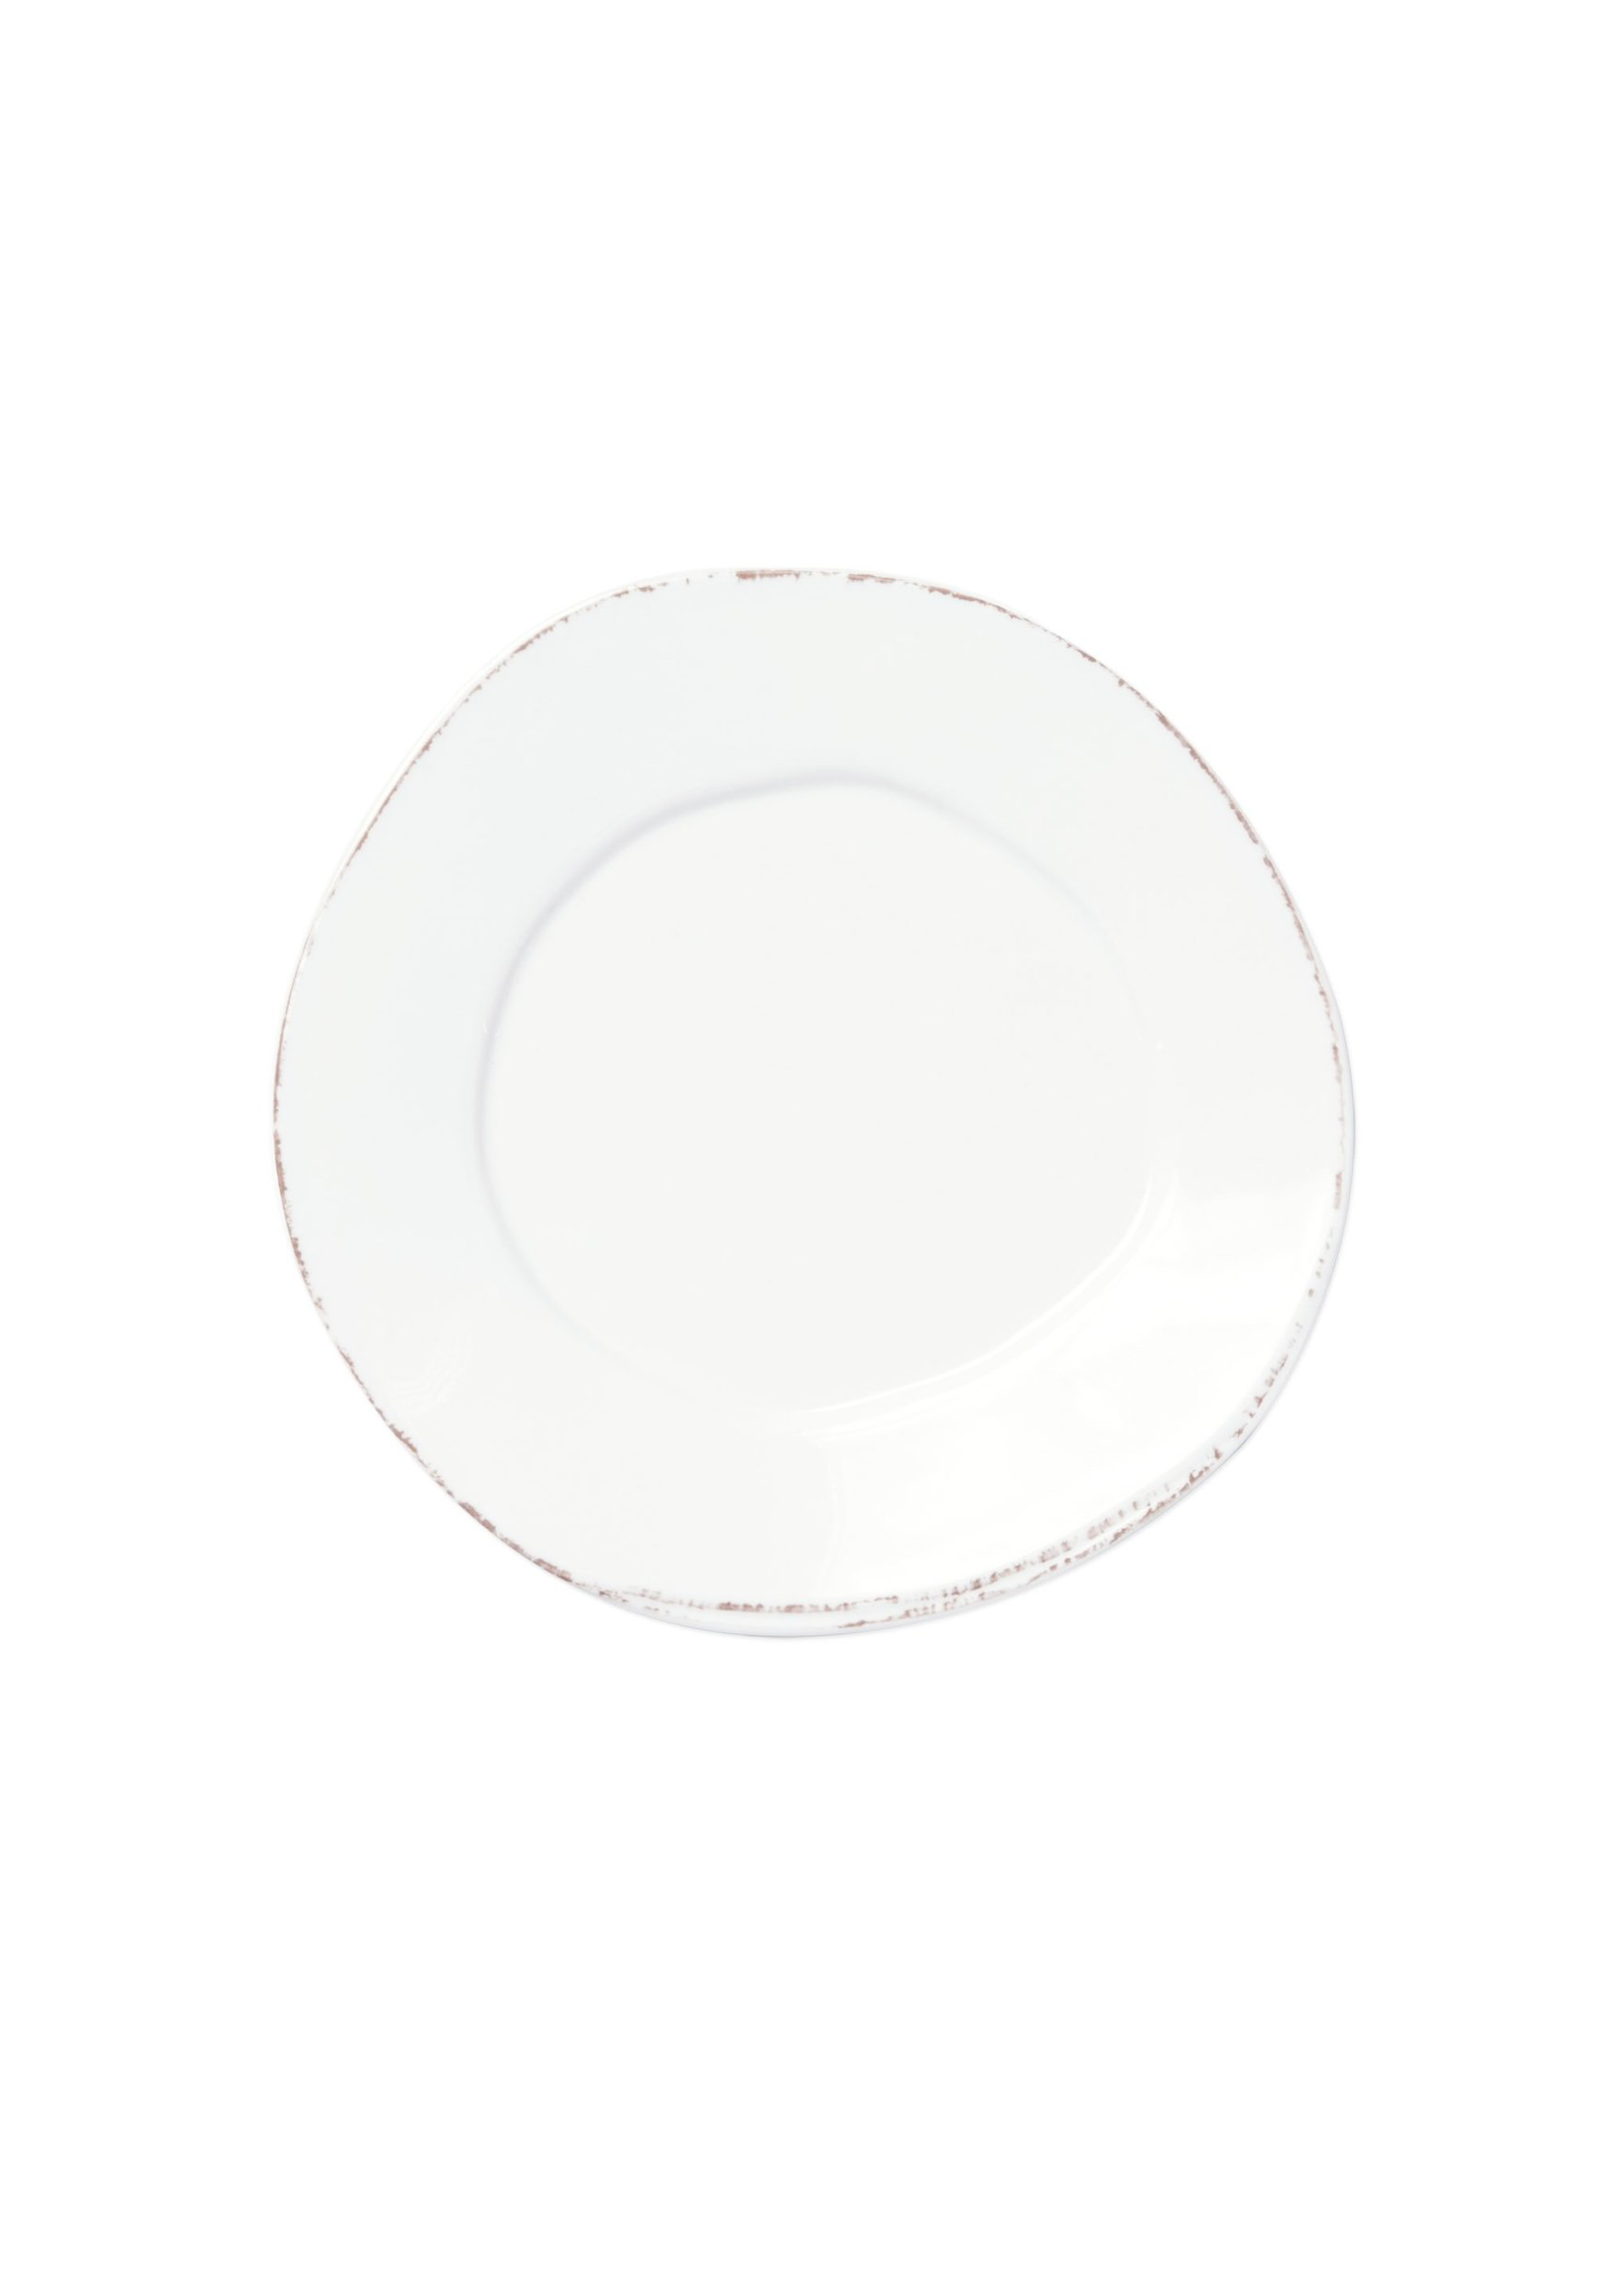 Vietri Lastra Melamine White Salad Plate